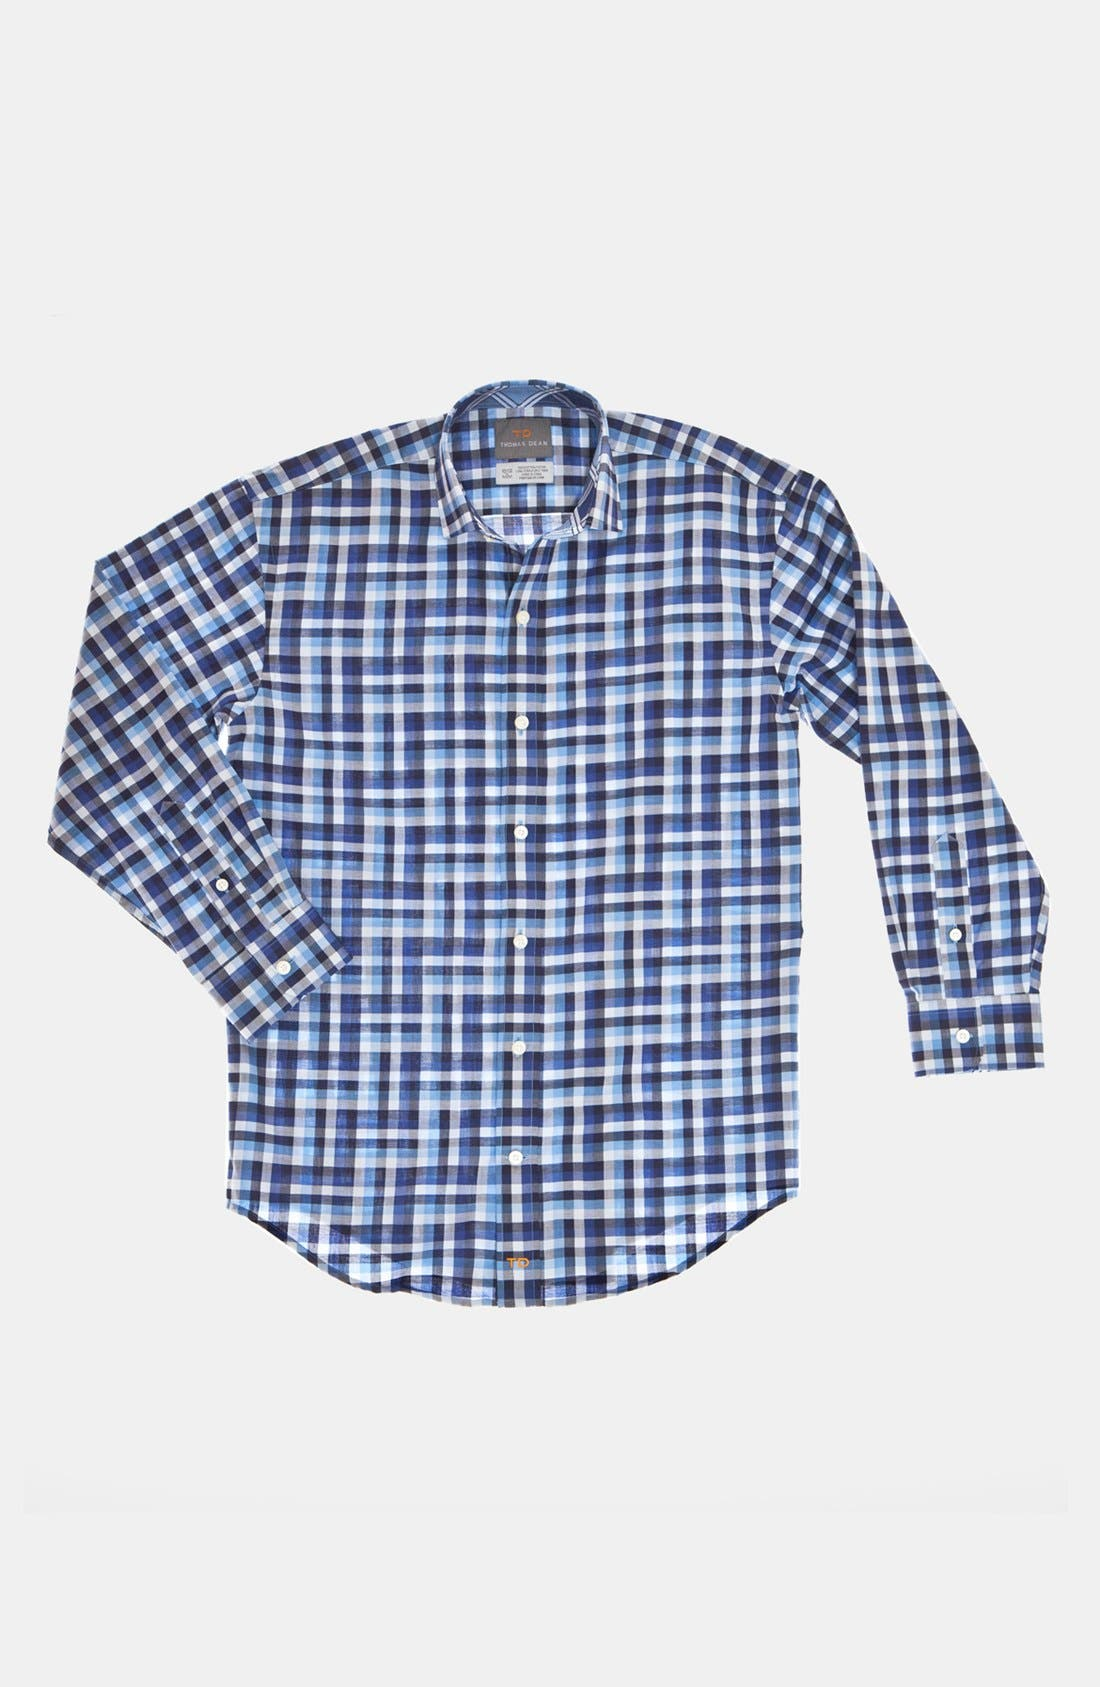 Alternate Image 1 Selected - Thomas Dean Check Dress Shirt (Big Boys)